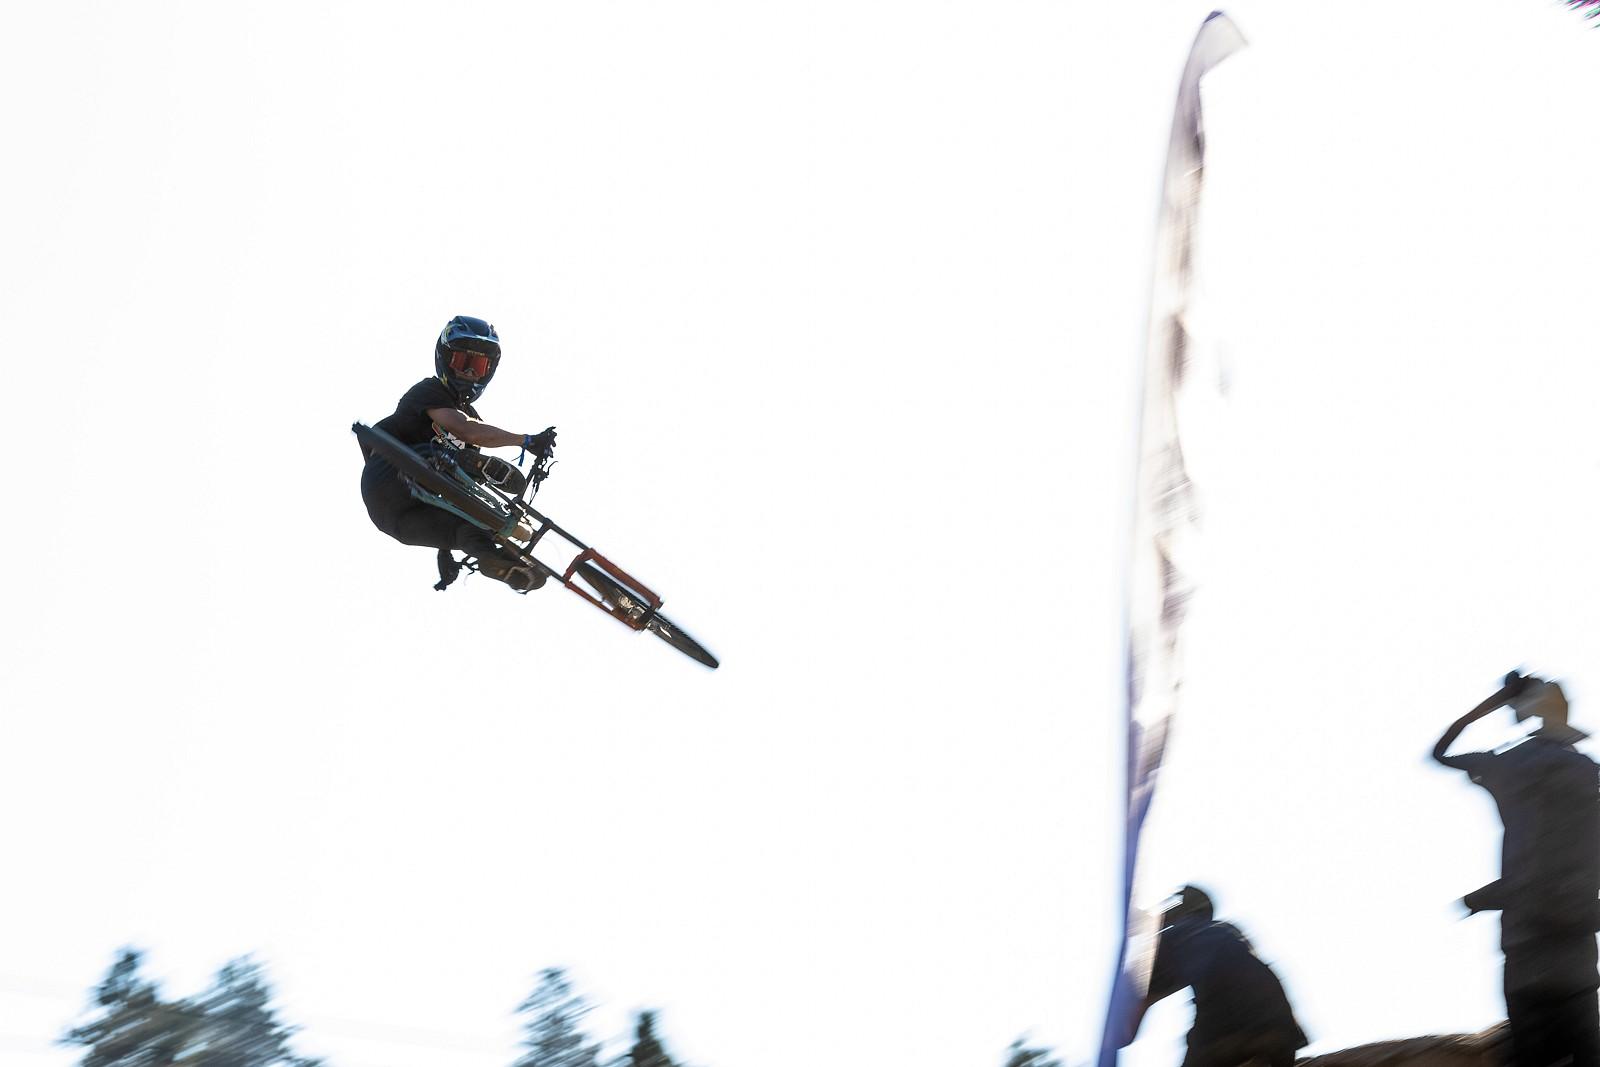 2019UsOpenWhip-2 - ALeedomPhotography - Mountain Biking Pictures - Vital MTB